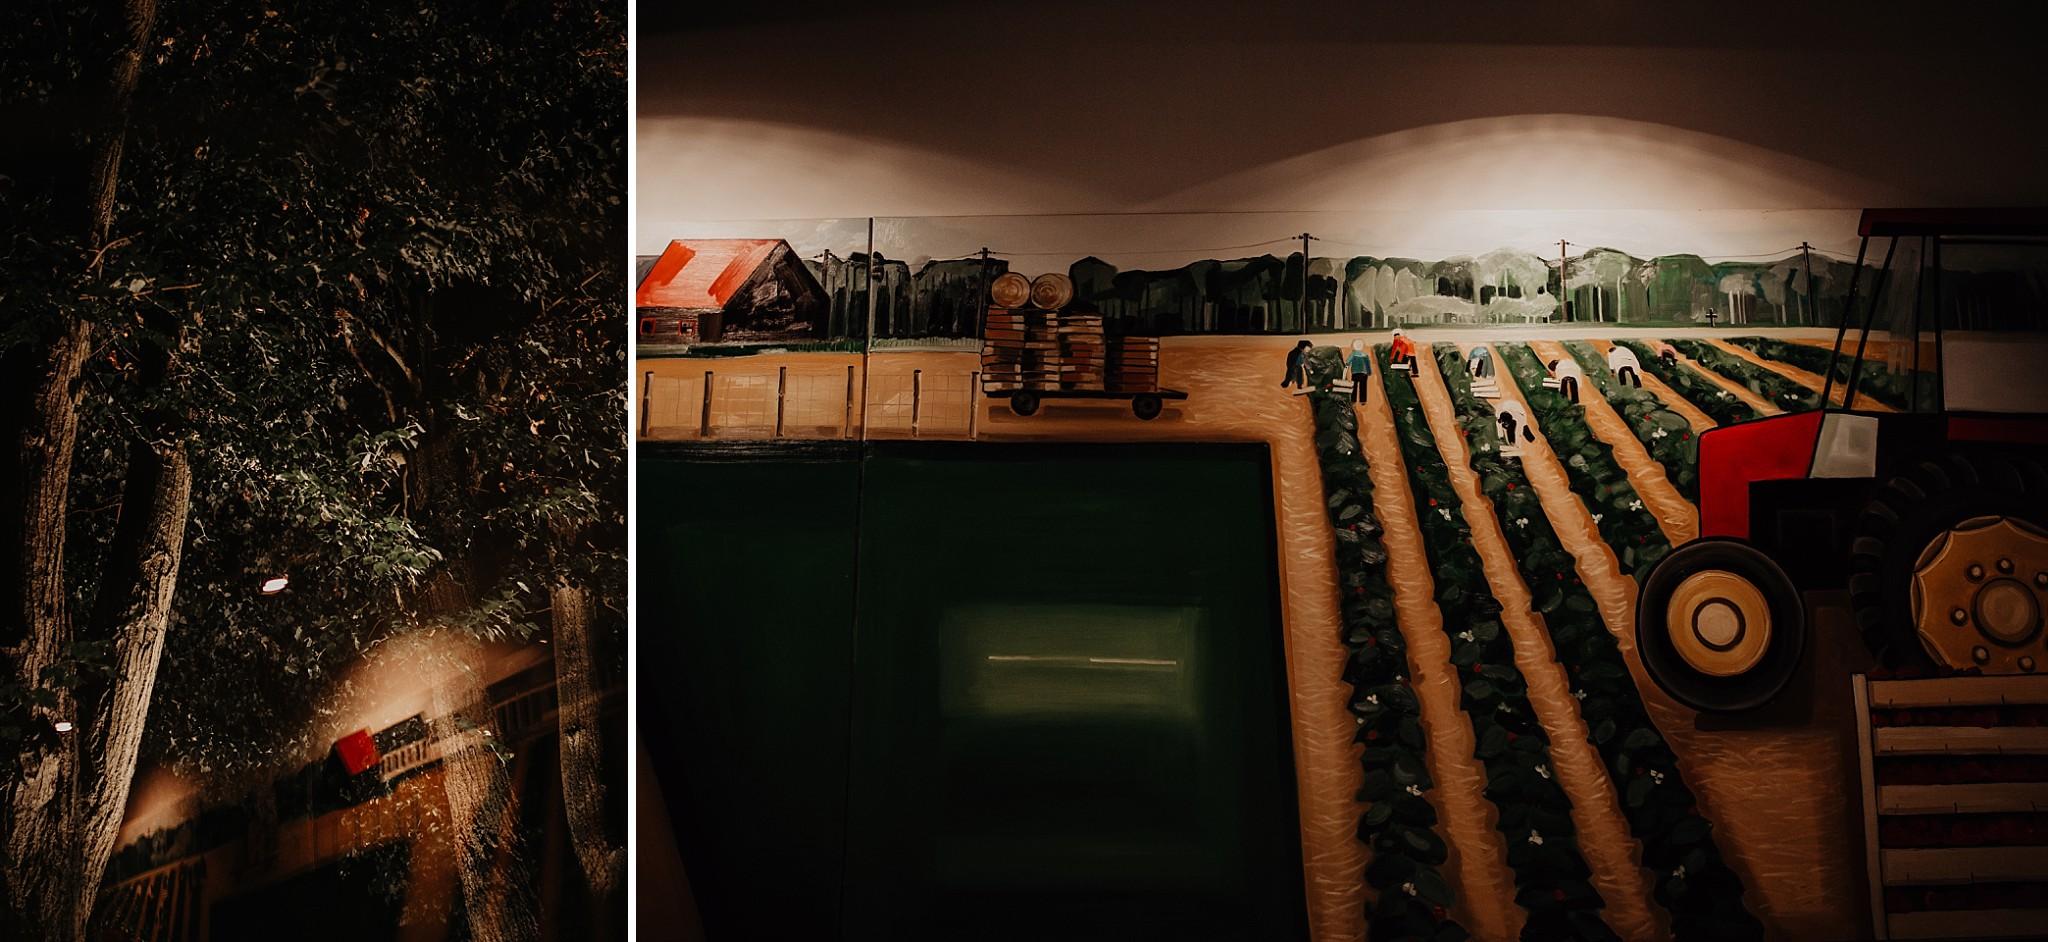 fotograf poznan wesele dobra truskawka piekne wesele pod poznaniem wesele w dobrej truskawce piekna para mloda slub marzen slub koronawirus slub listopad wesele koronawirus 247